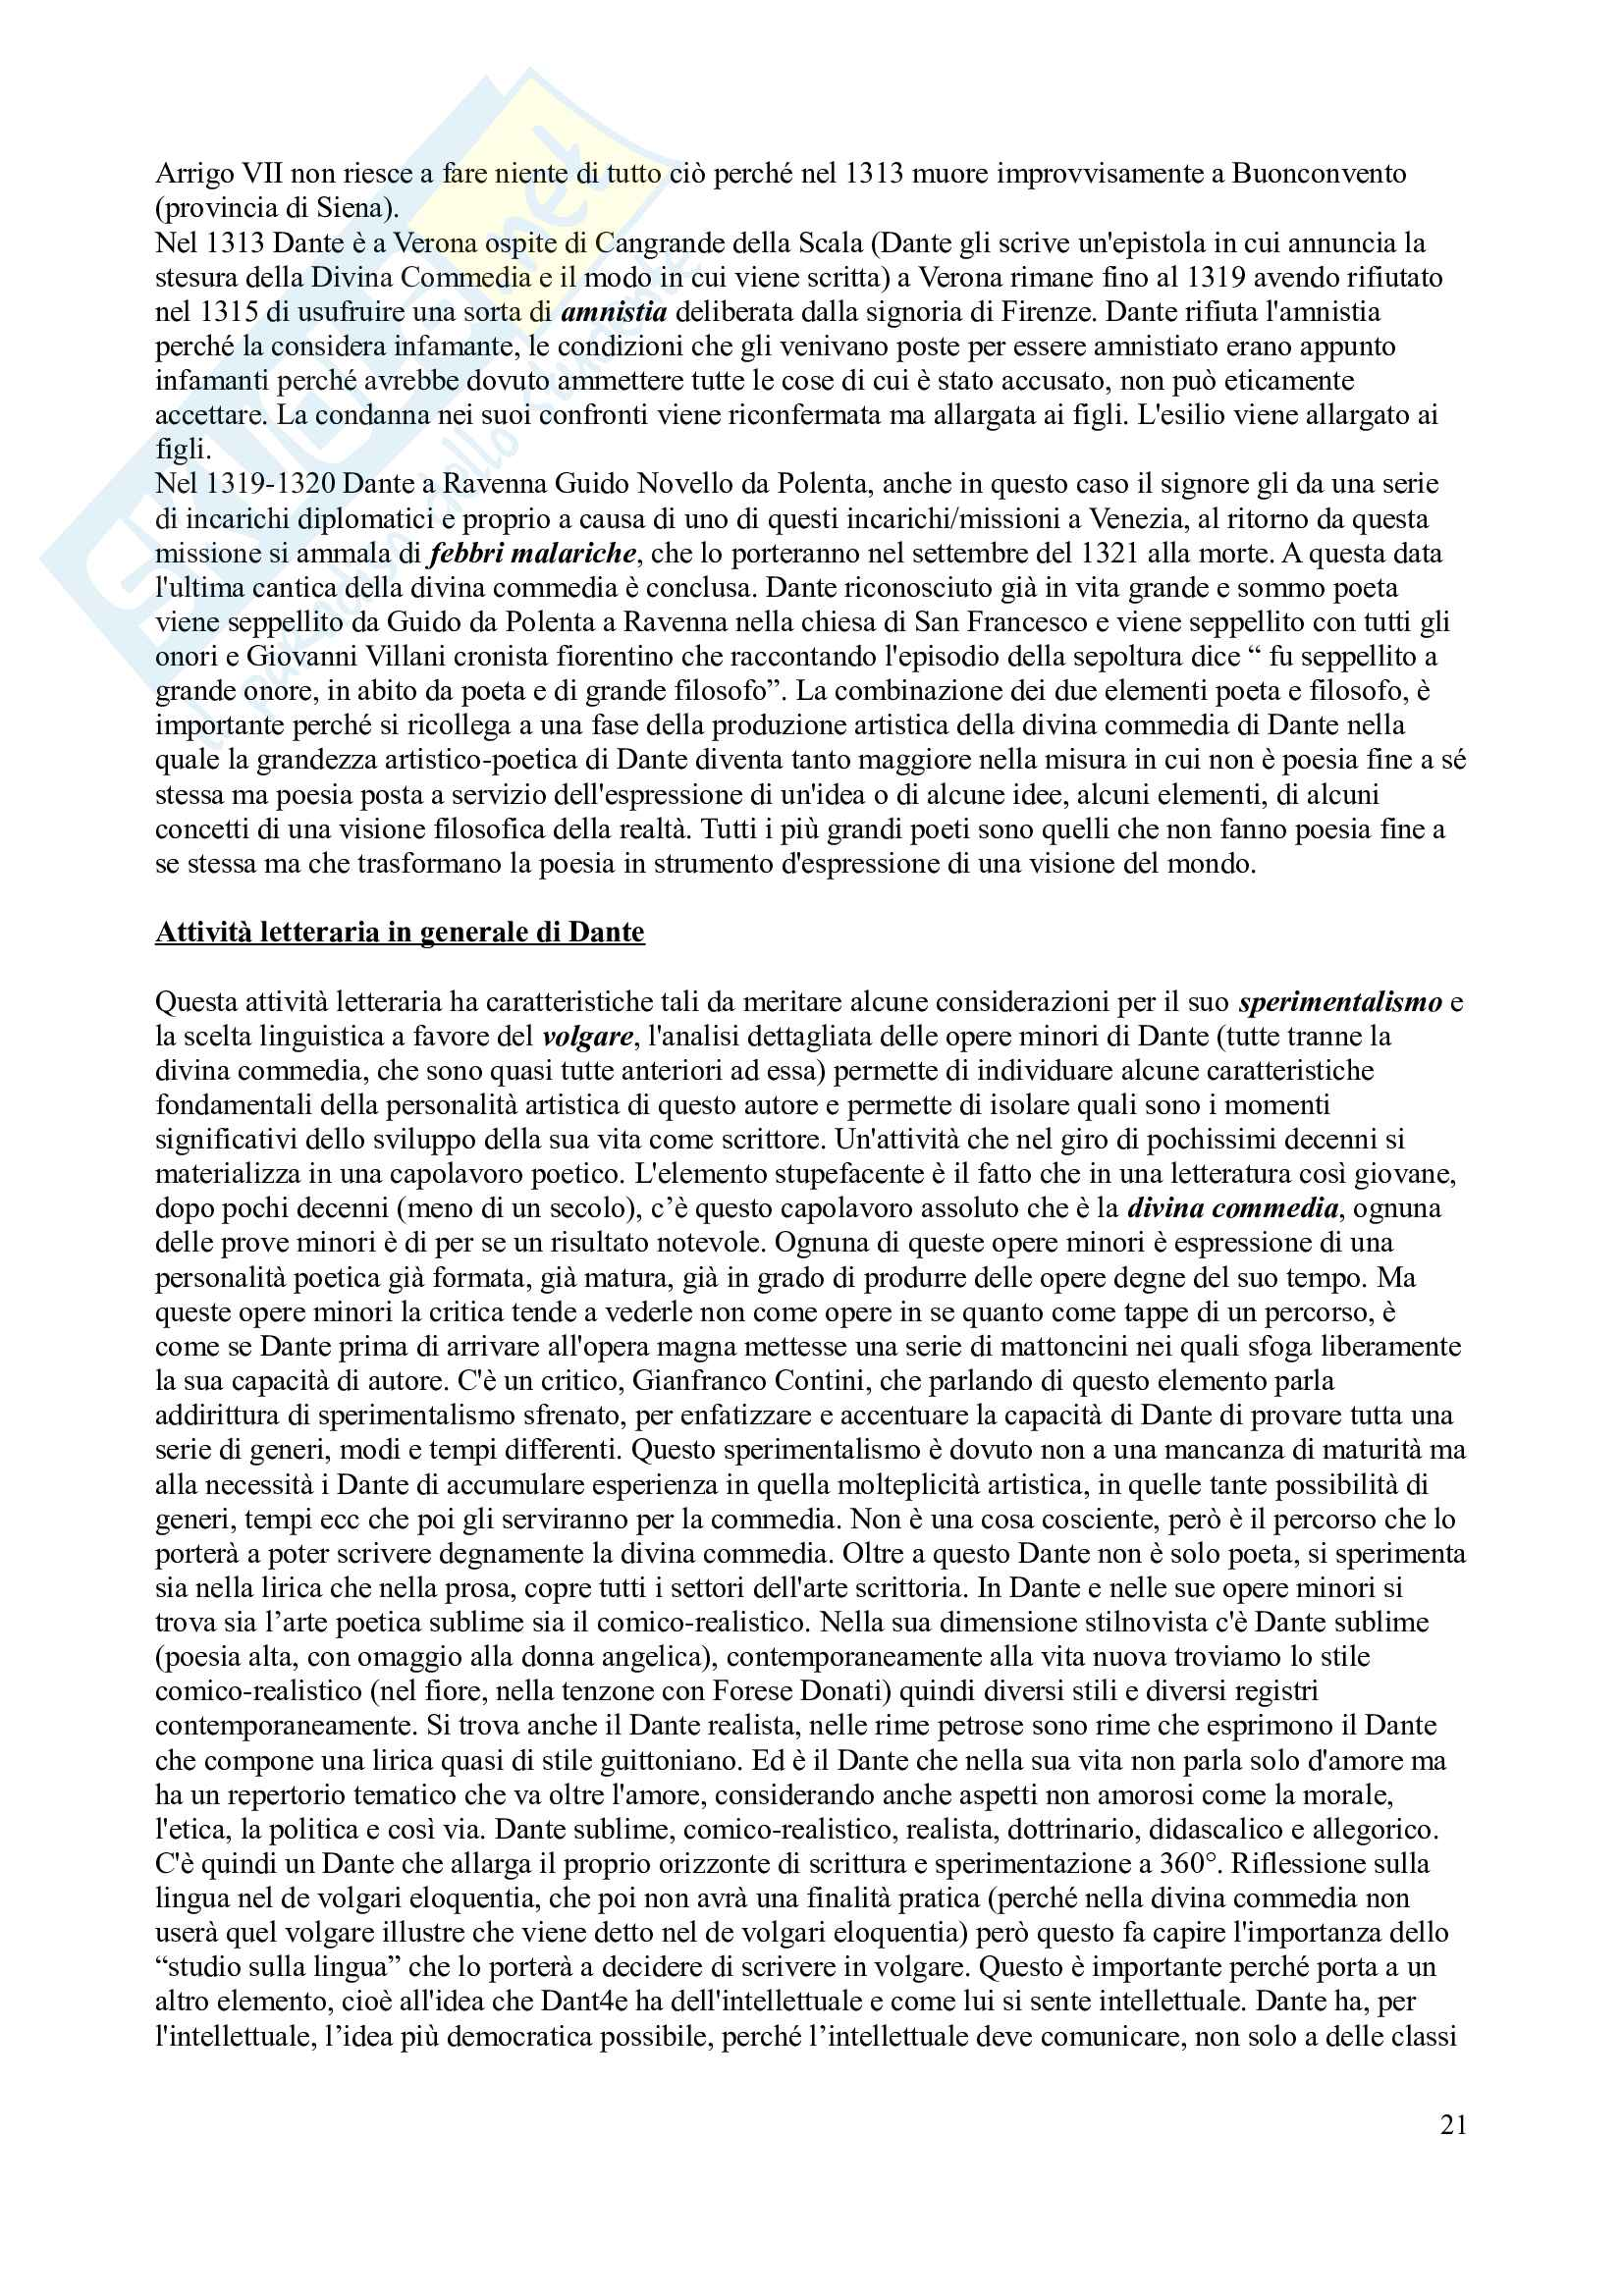 Letteratura Italiana Duecento e Trecento seconda parte Pag. 21